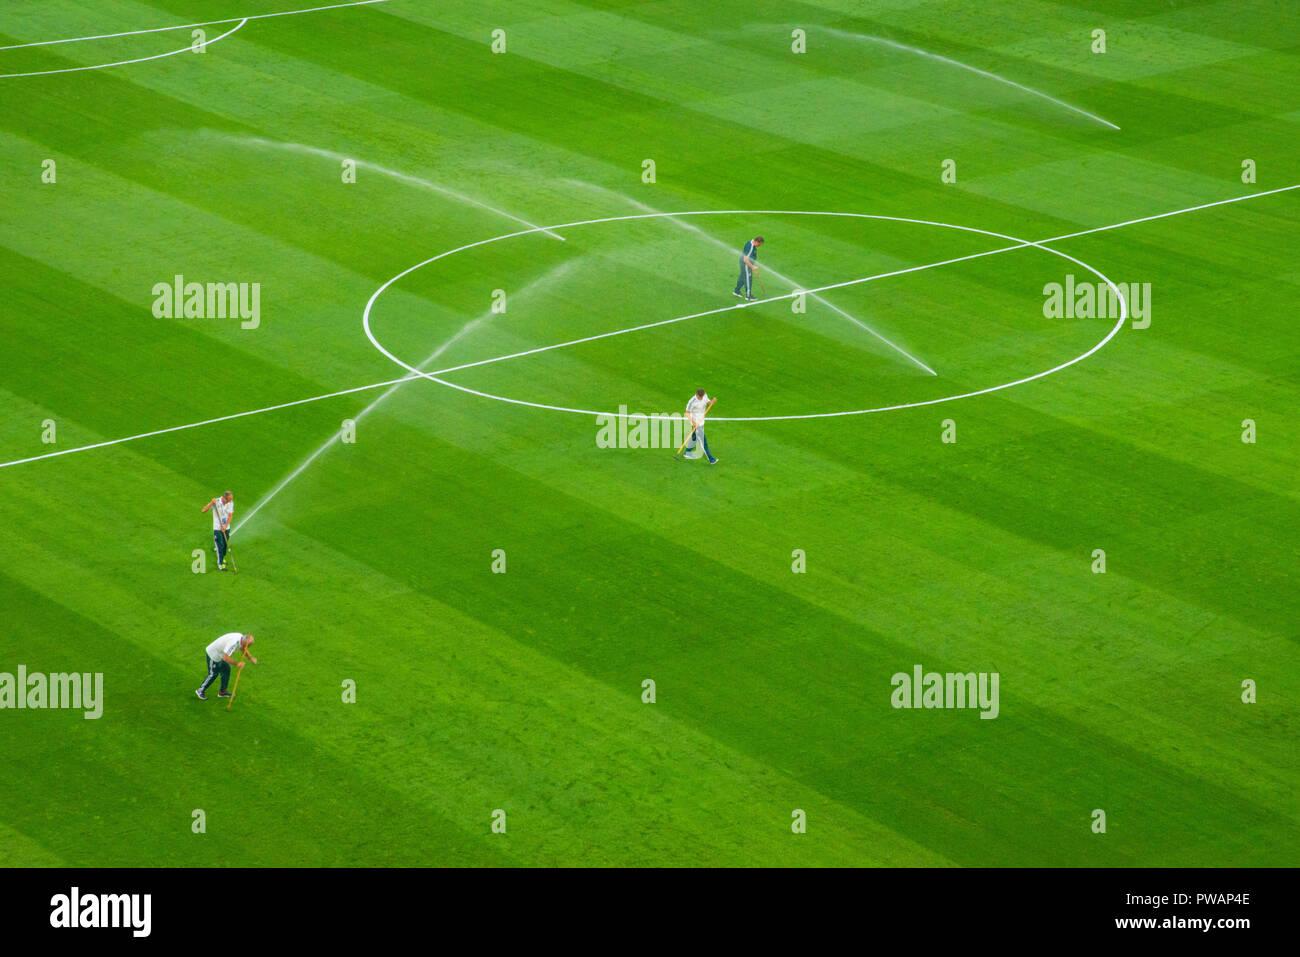 People setting up the field before a football match. Santiago Bernabeu stadium, Madrid, Spain. - Stock Image